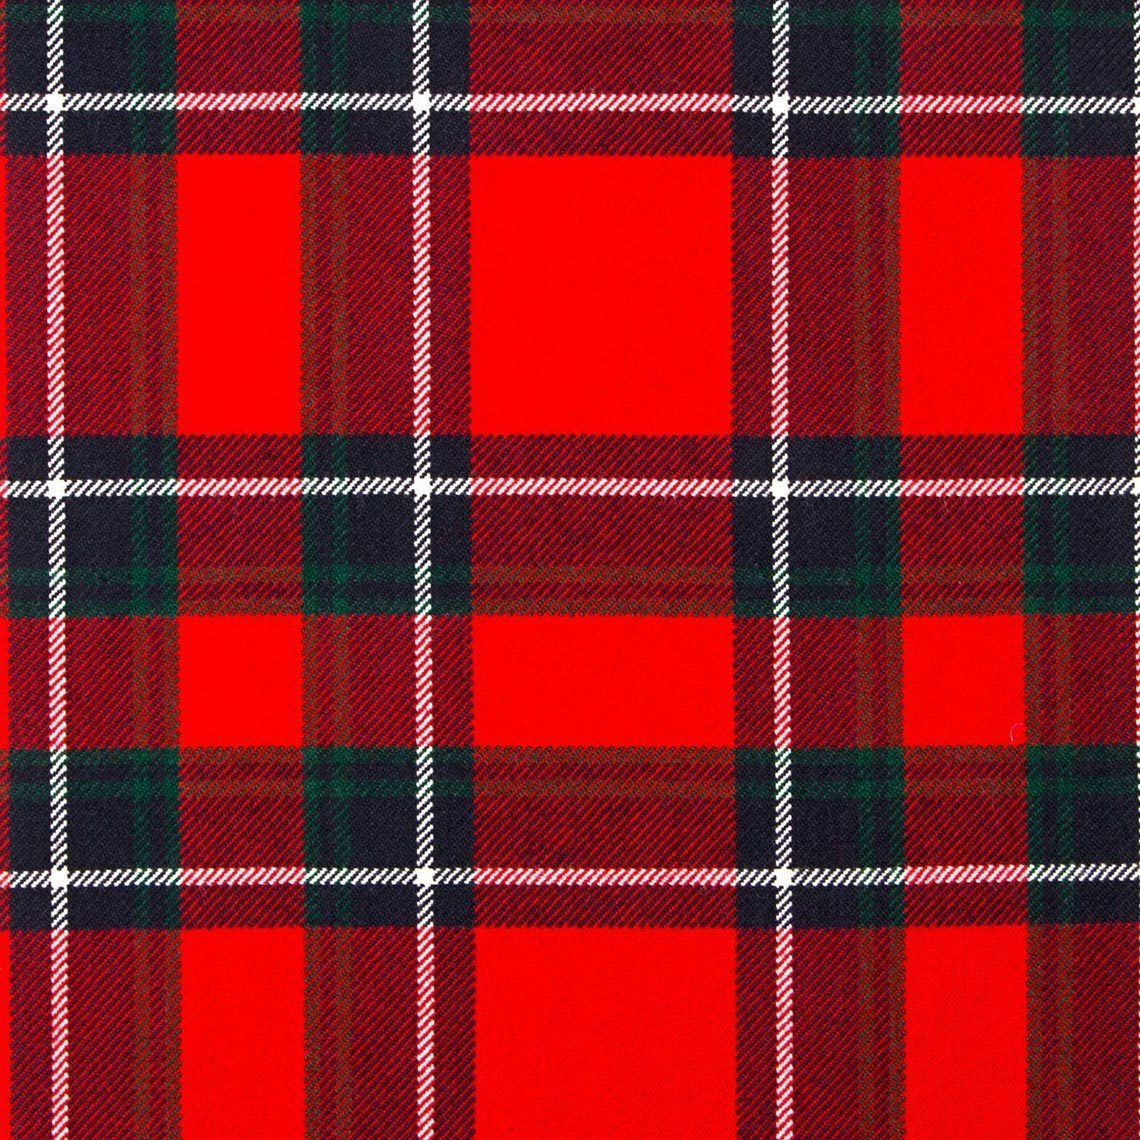 Inverness (Modern) Kilt